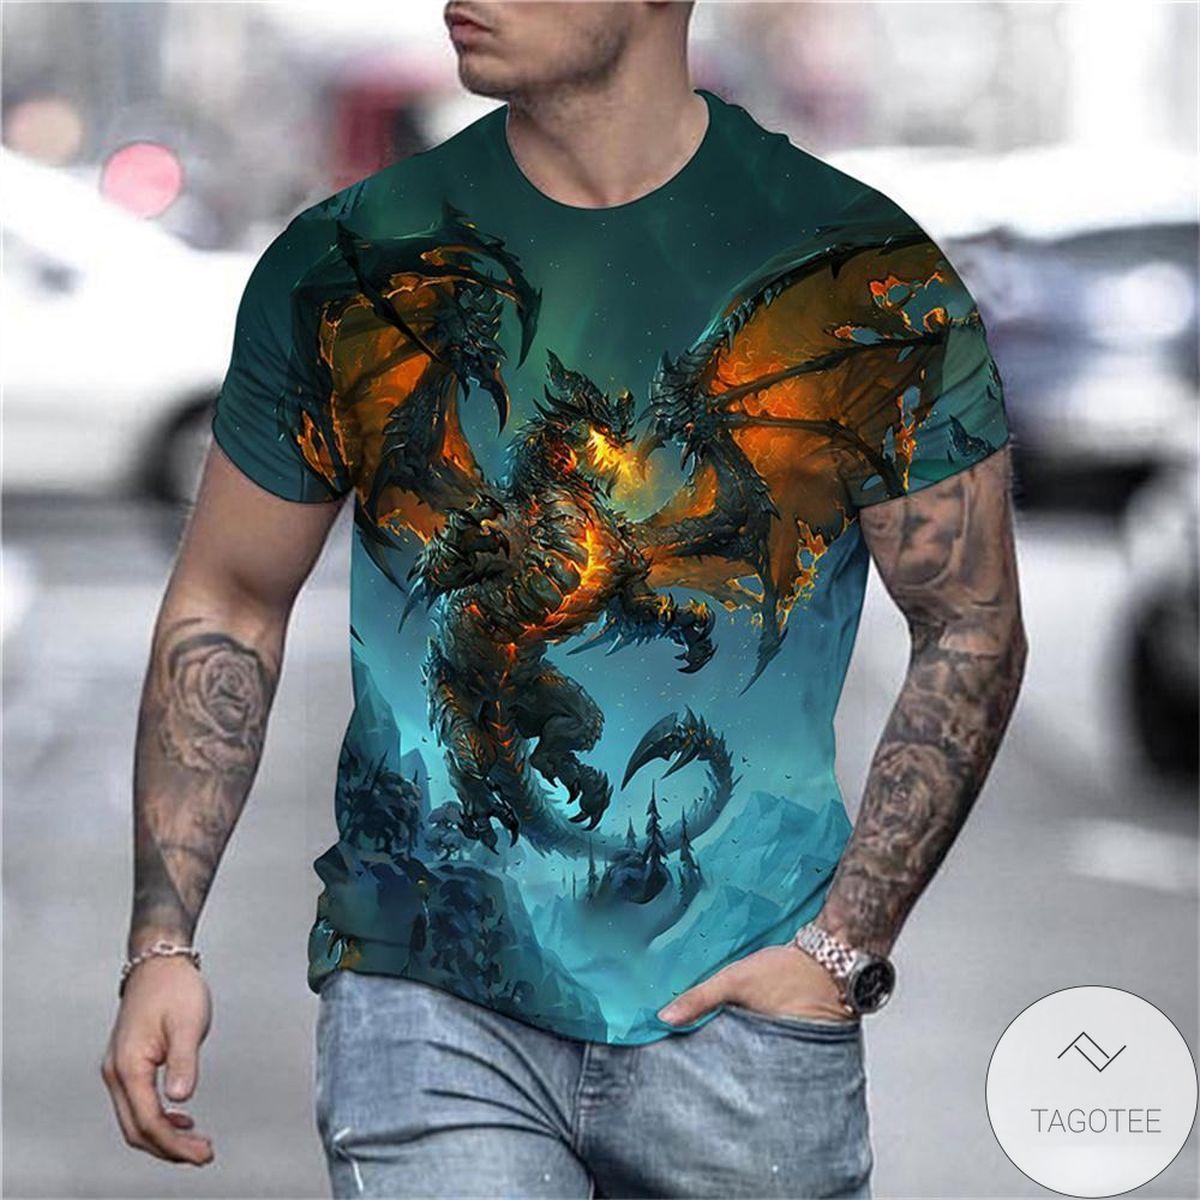 The Dragon 3d Graphic Printed Short Sleeve Shirt